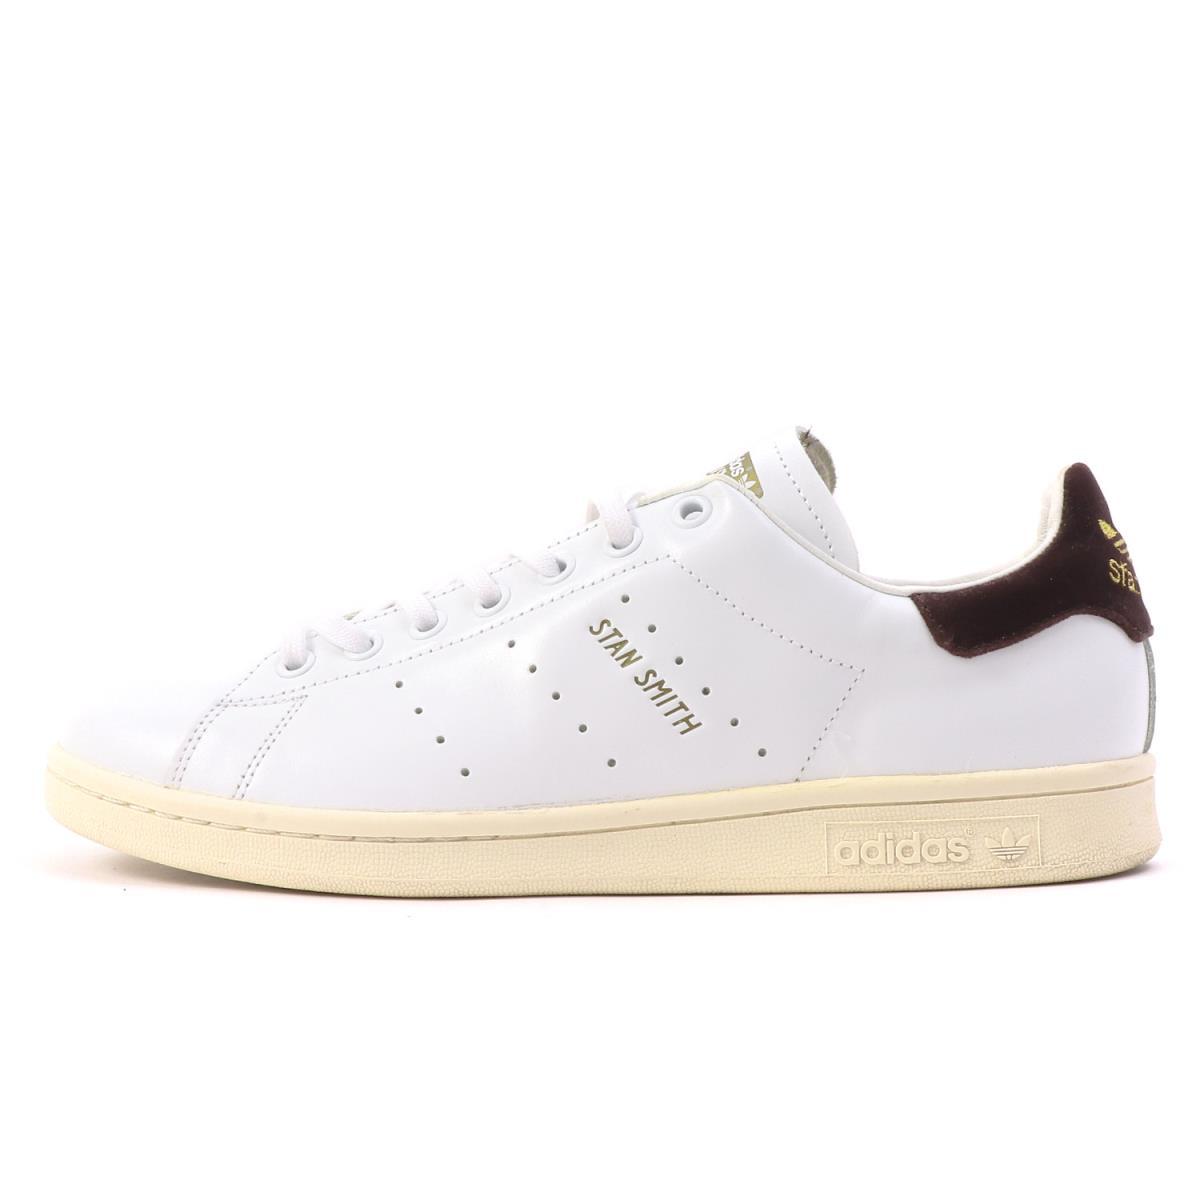 big sale 887be 57721 adidas (Adidas) 16A/W X BEAUTY&YOUTH STAN SMITH BY (glass leather / BA7417)  white X brown US9.5(27.5cm)